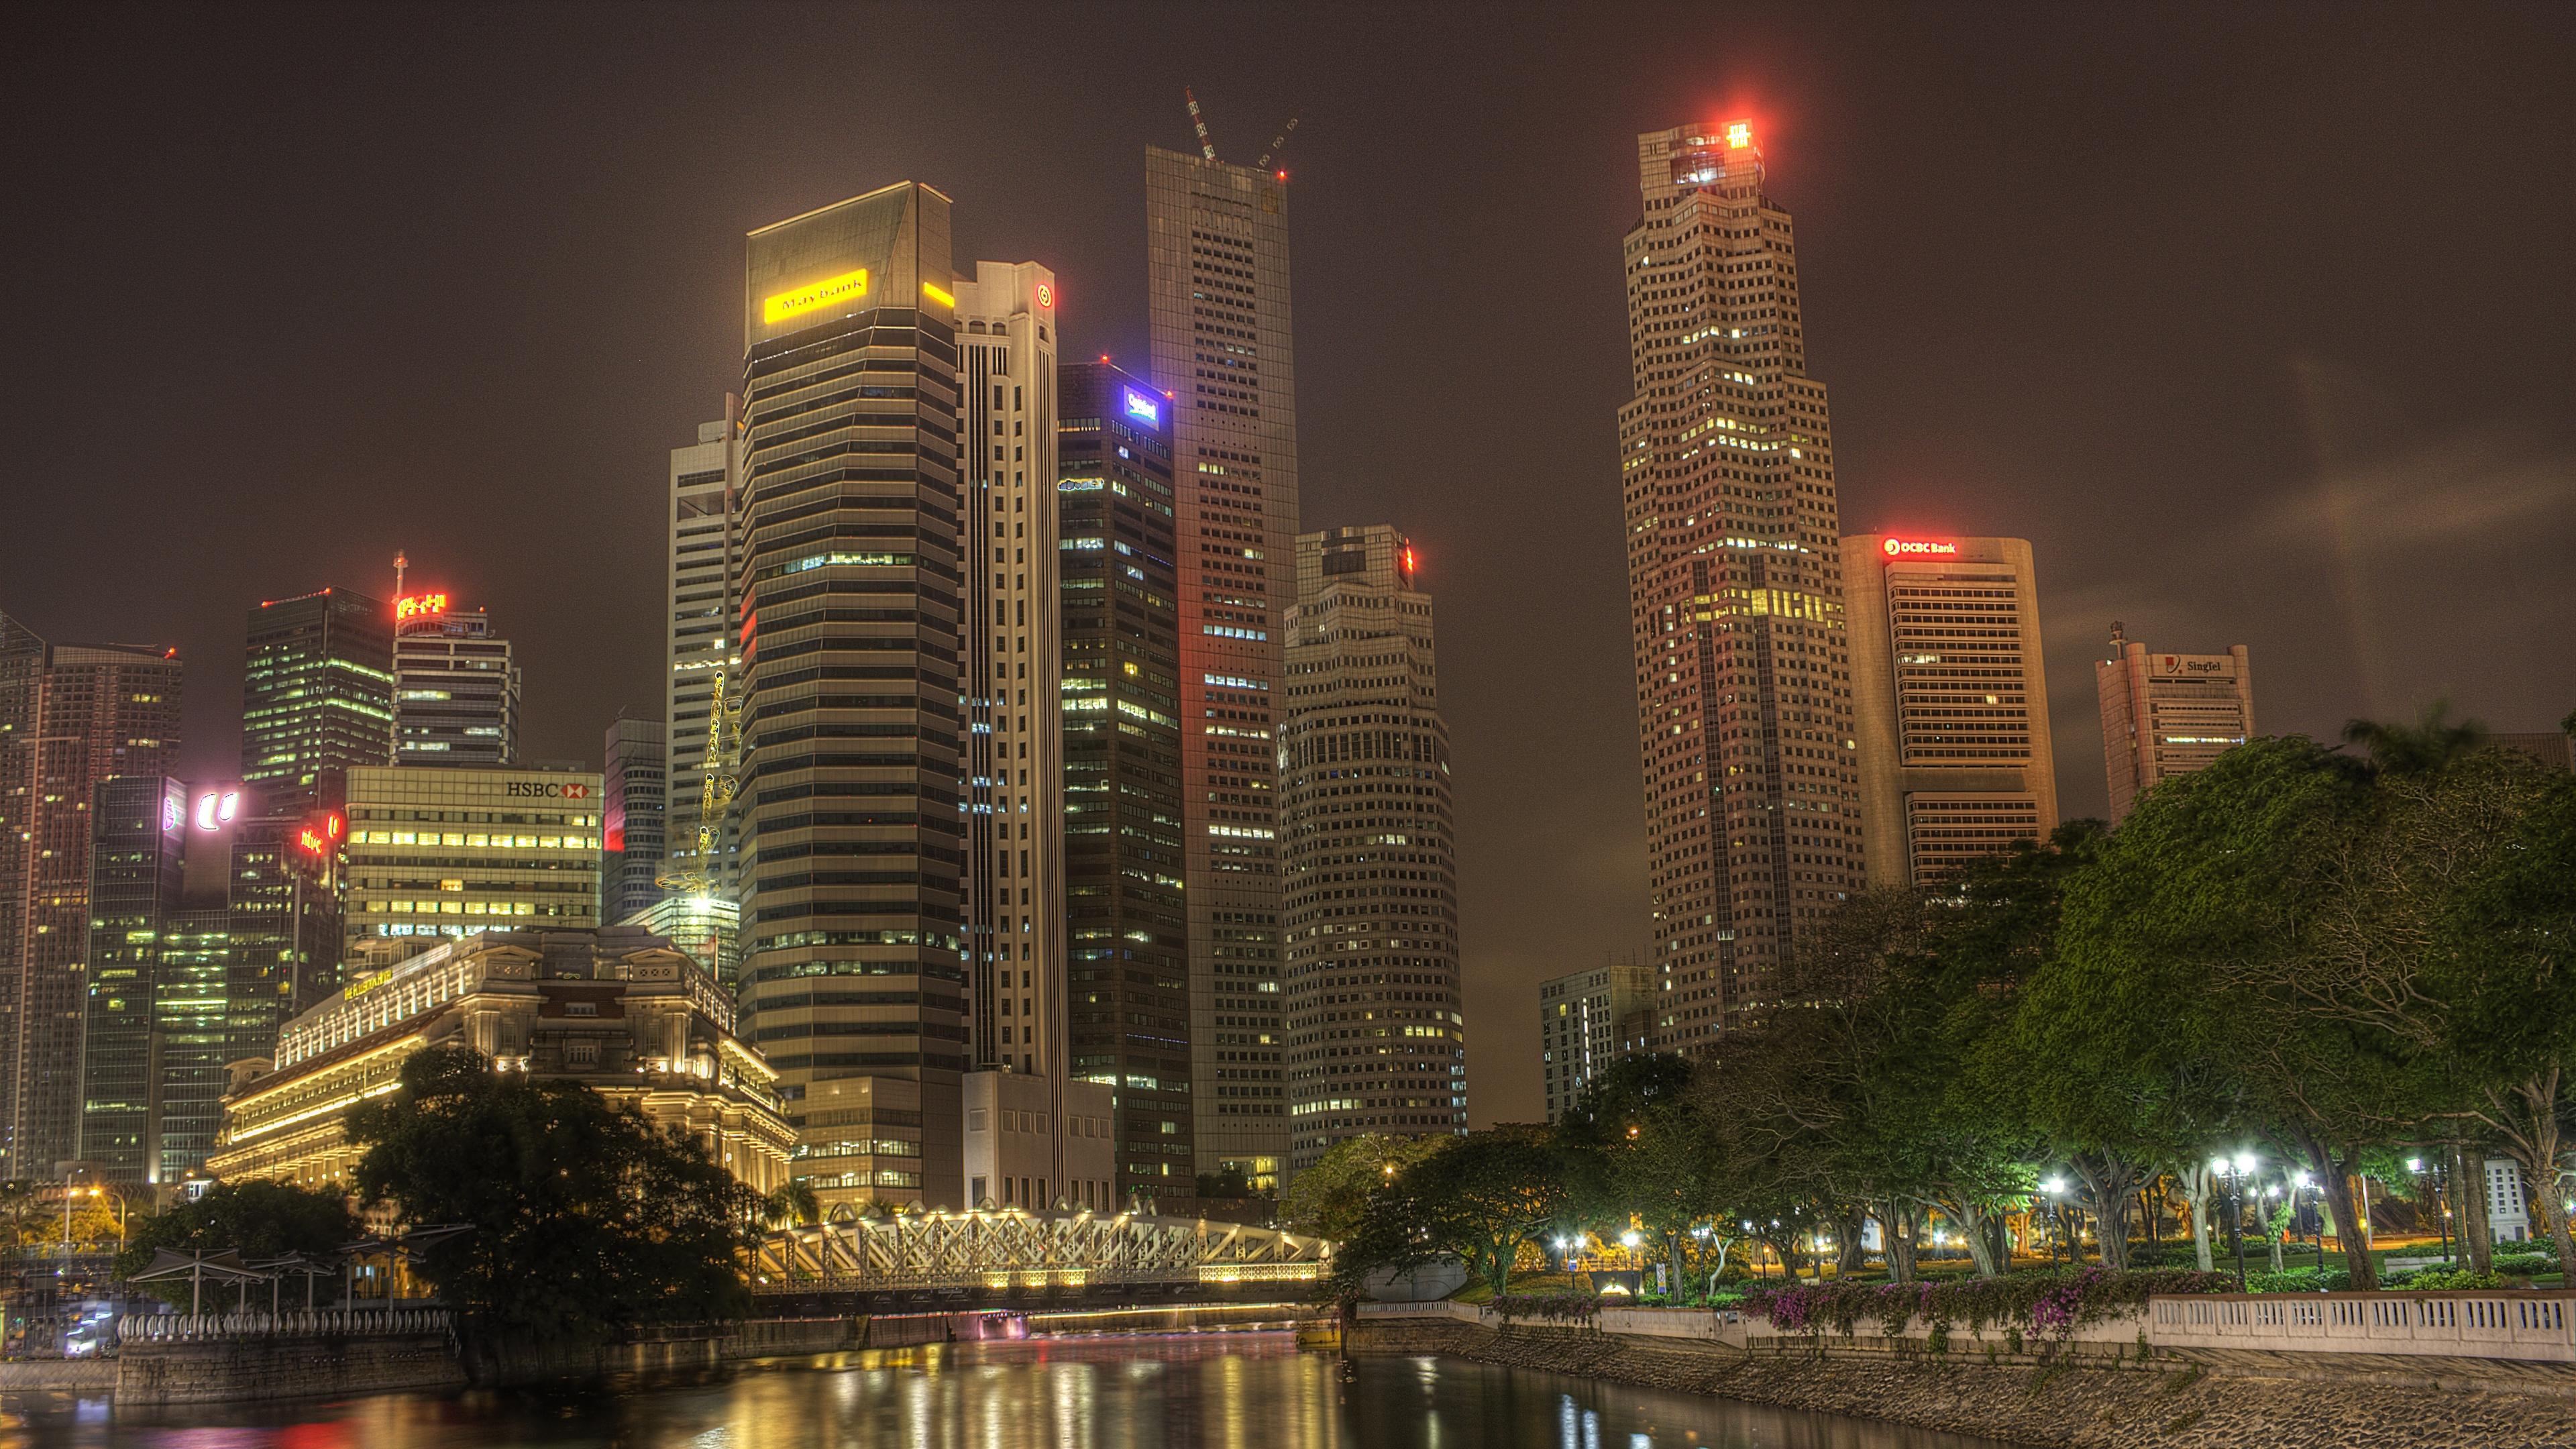 city night lights 4k 1538066351 - city, night, lights 4k - Night, Lights, City